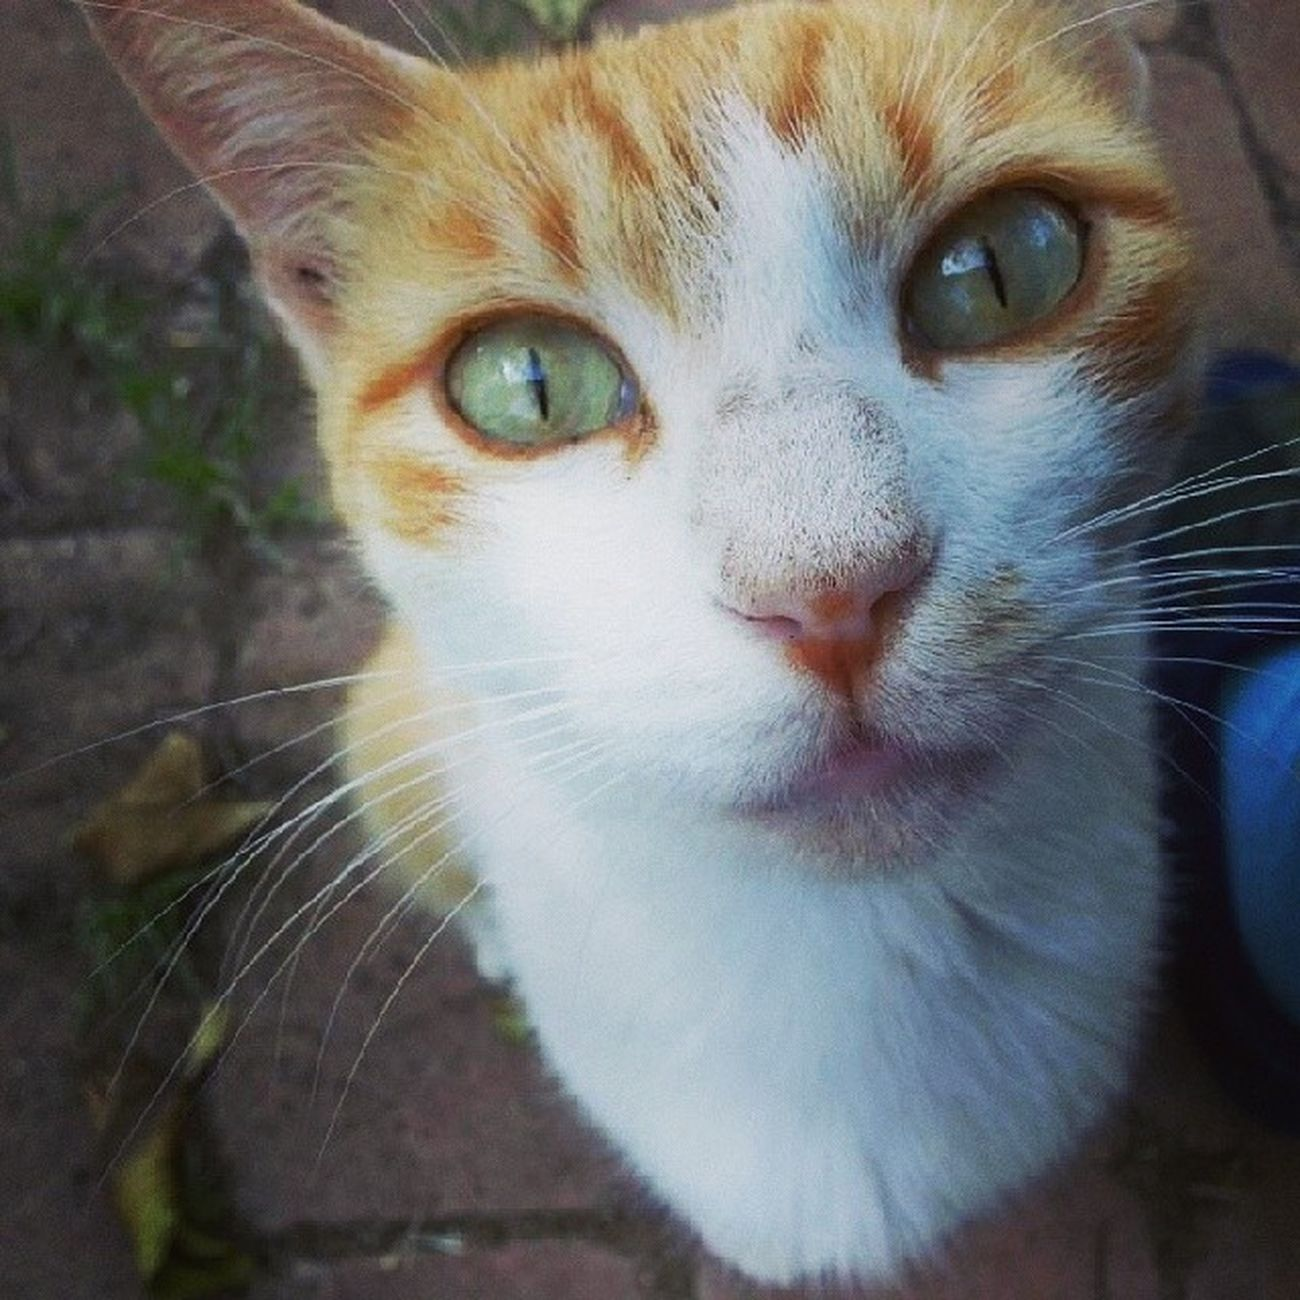 Cat Gatta Bellissima Occhiverdi eyes